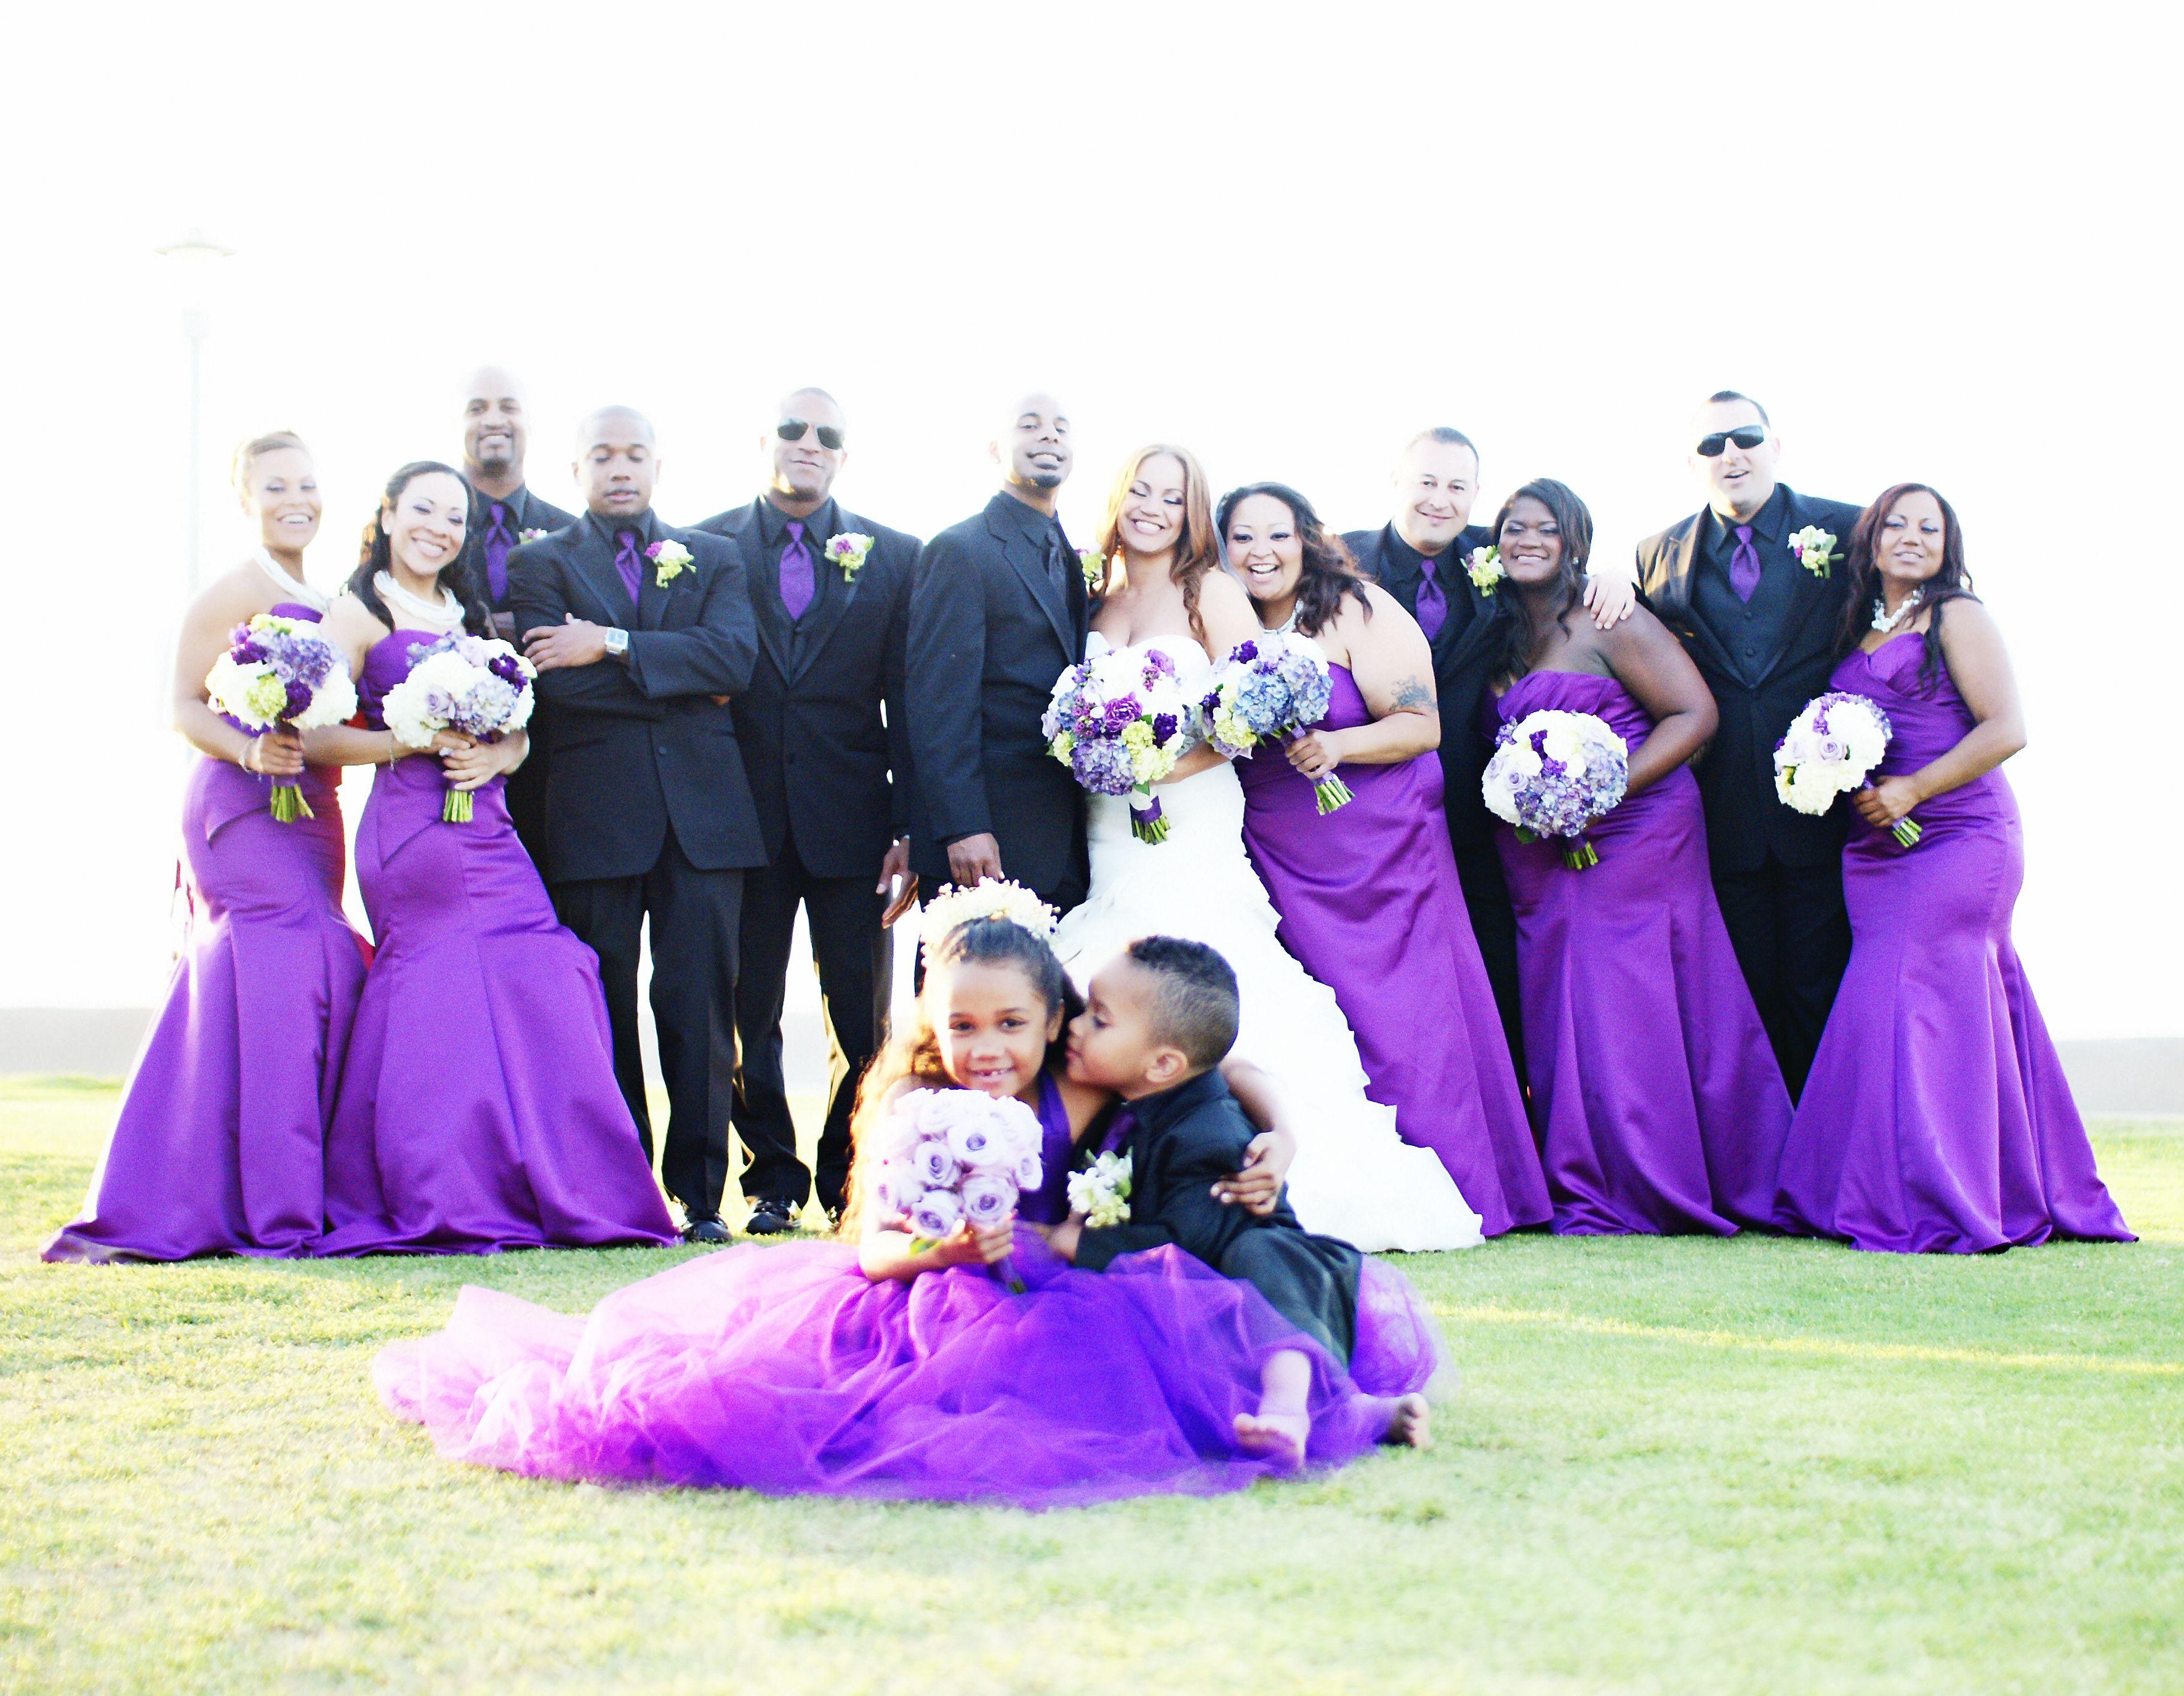 Bridal party at La Jolla Beach. Bright purple bridesmaids dresses ...